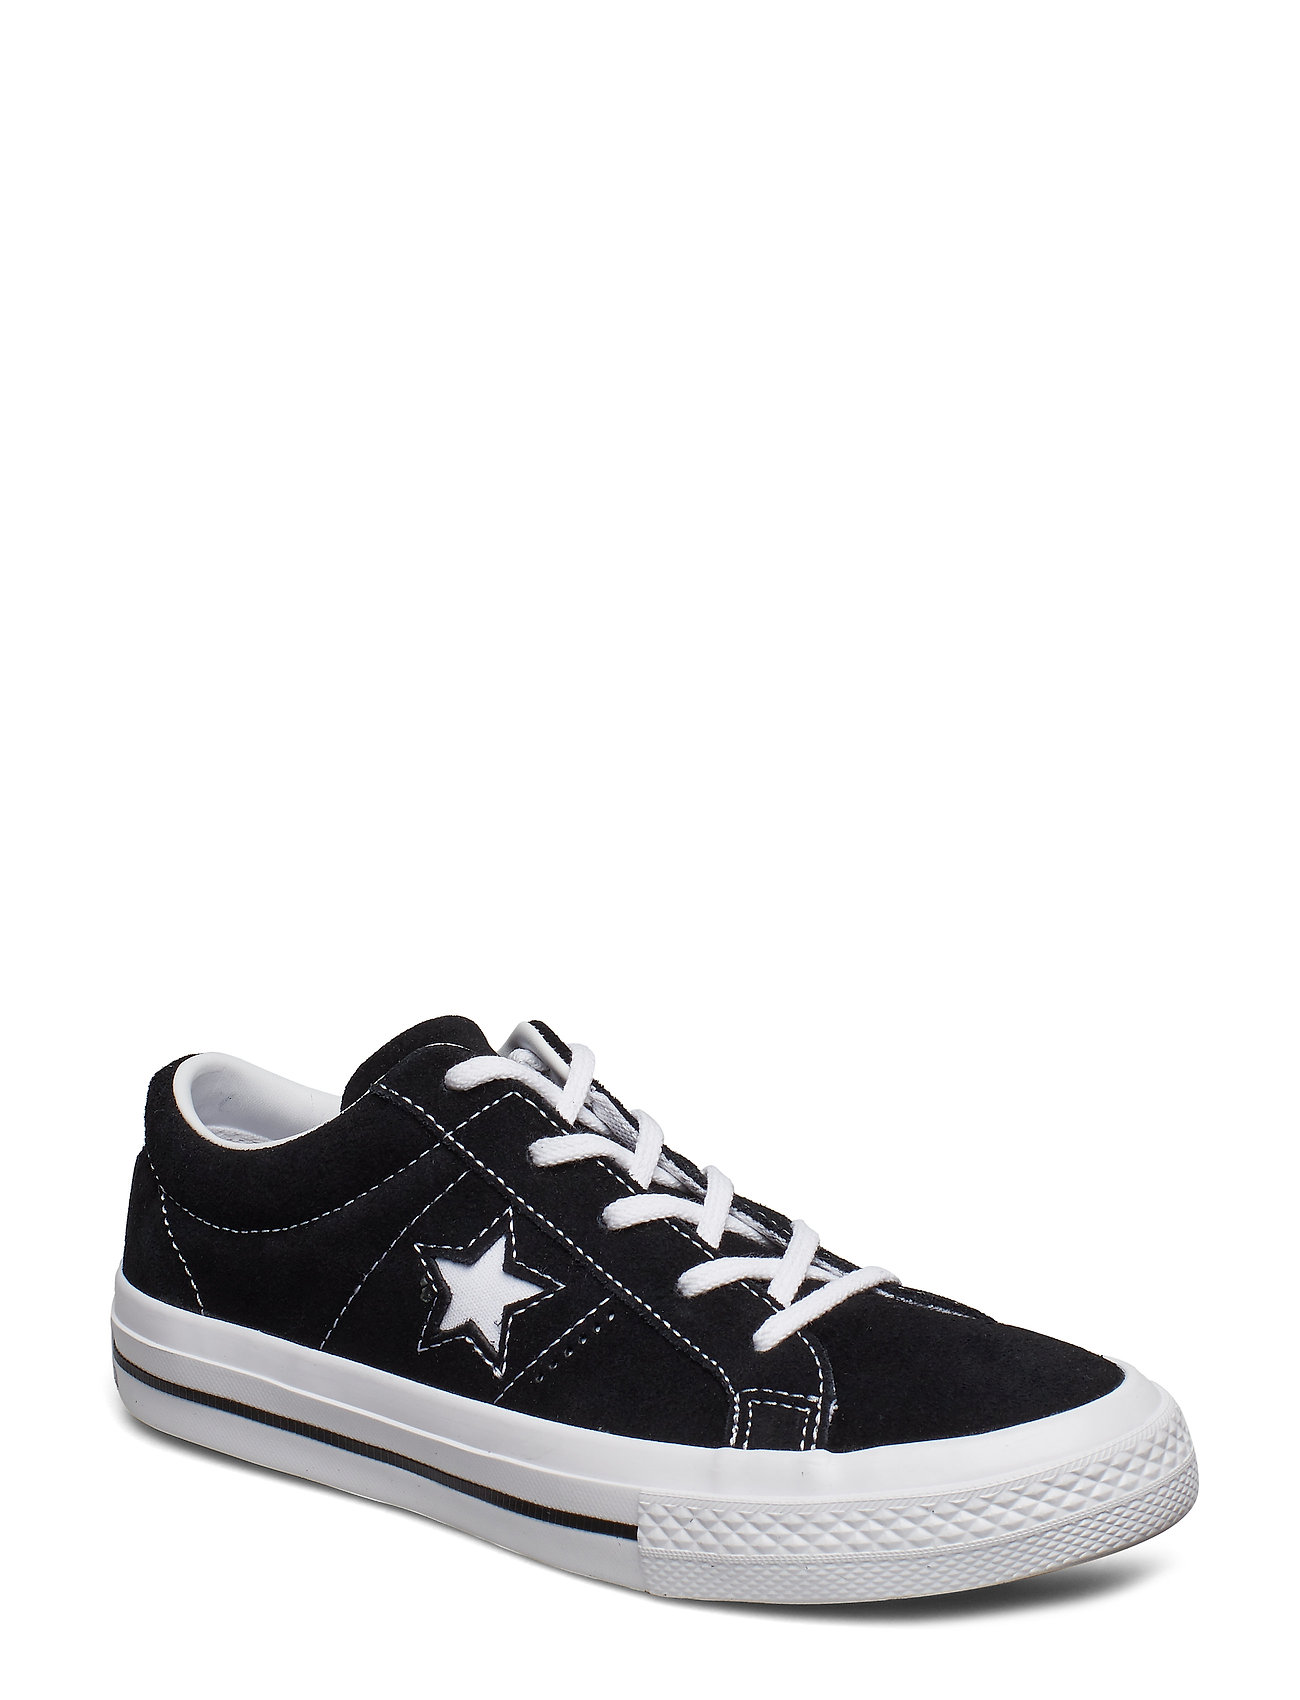 Converse ONE STAR OX - BLACK/WHITE/WHITE